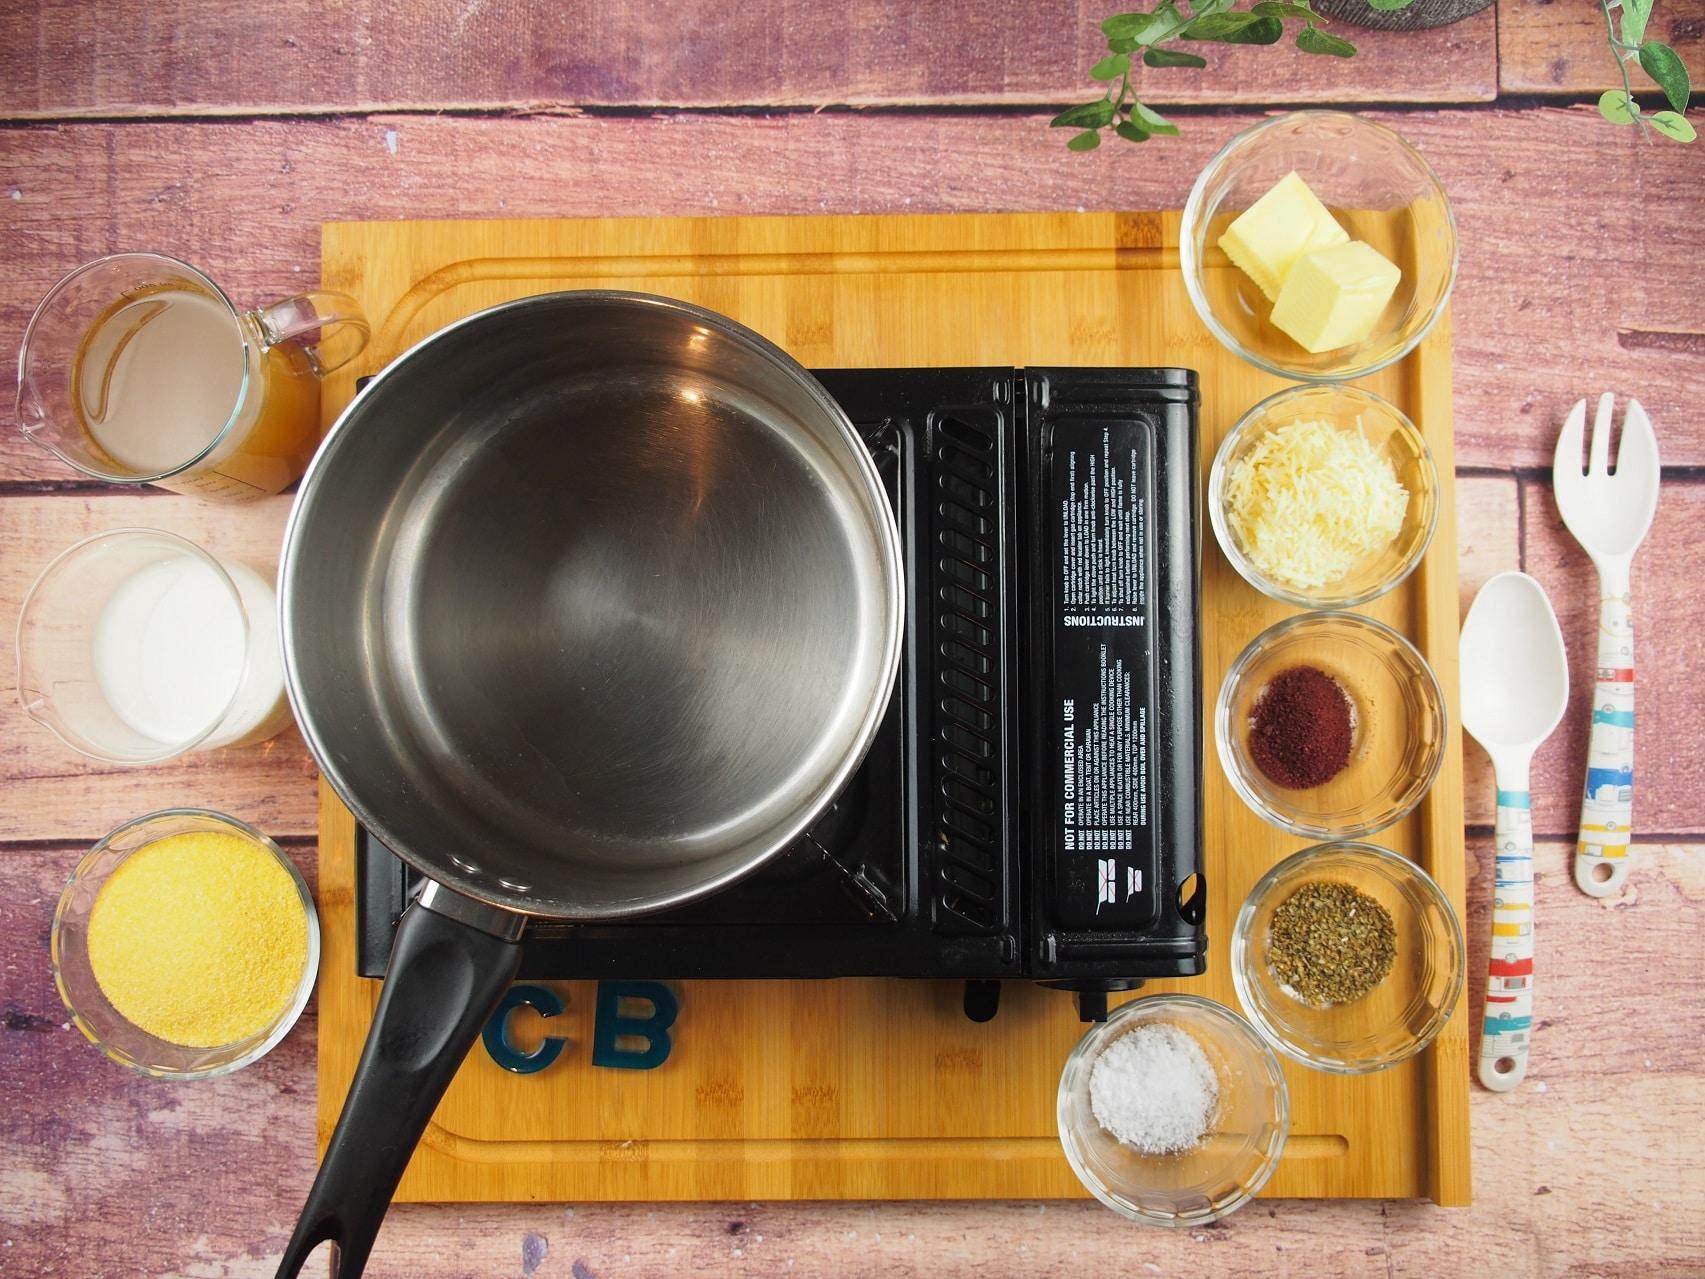 Cooking Blog - Polenta Chips with Sumac 2